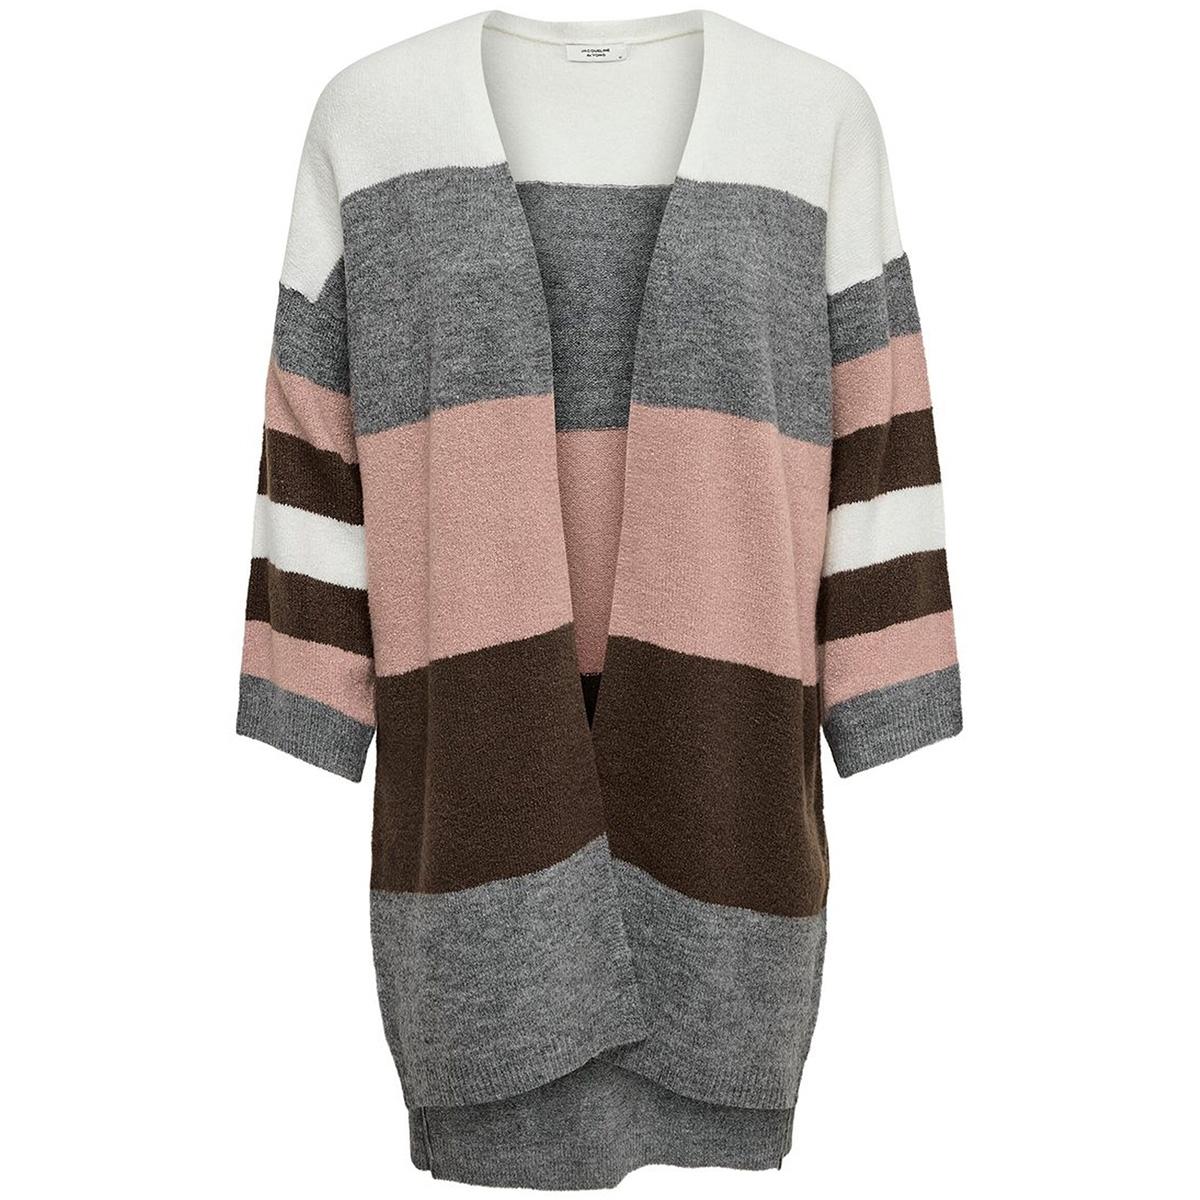 jdynora treats 7/8 cardigan knt 15176719 jacqueline de yong vest woodrose/stripe